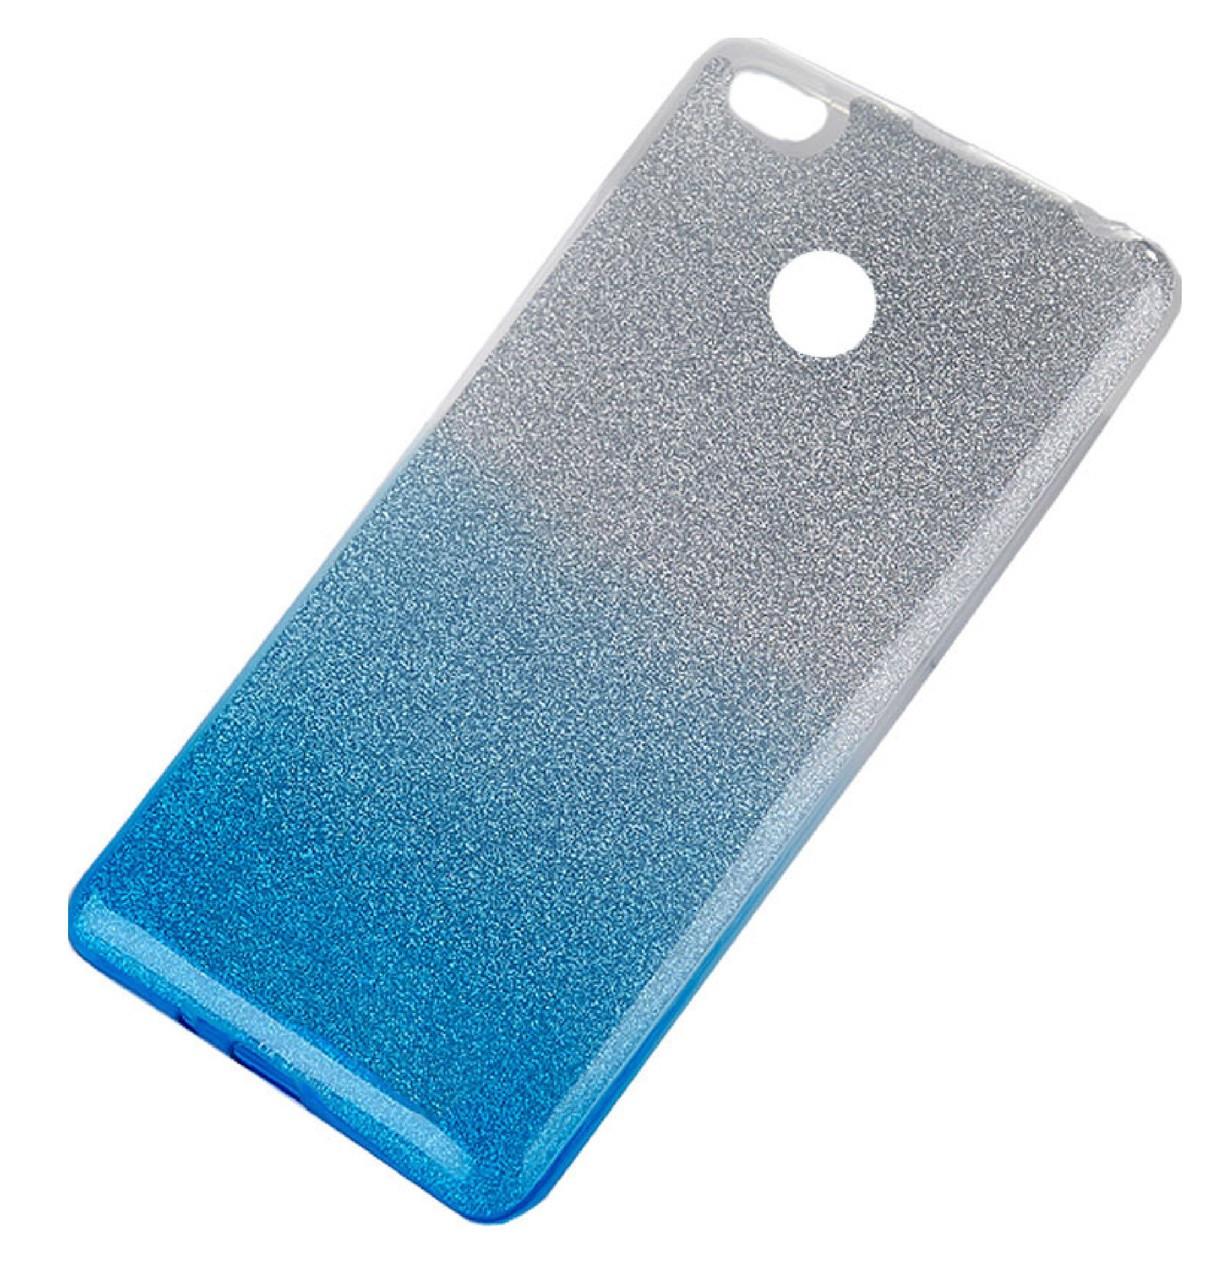 Чехол-накладка TOTO TPU Case Rose series Gradient для Xiaomi Redmi 4x Silver / Blue